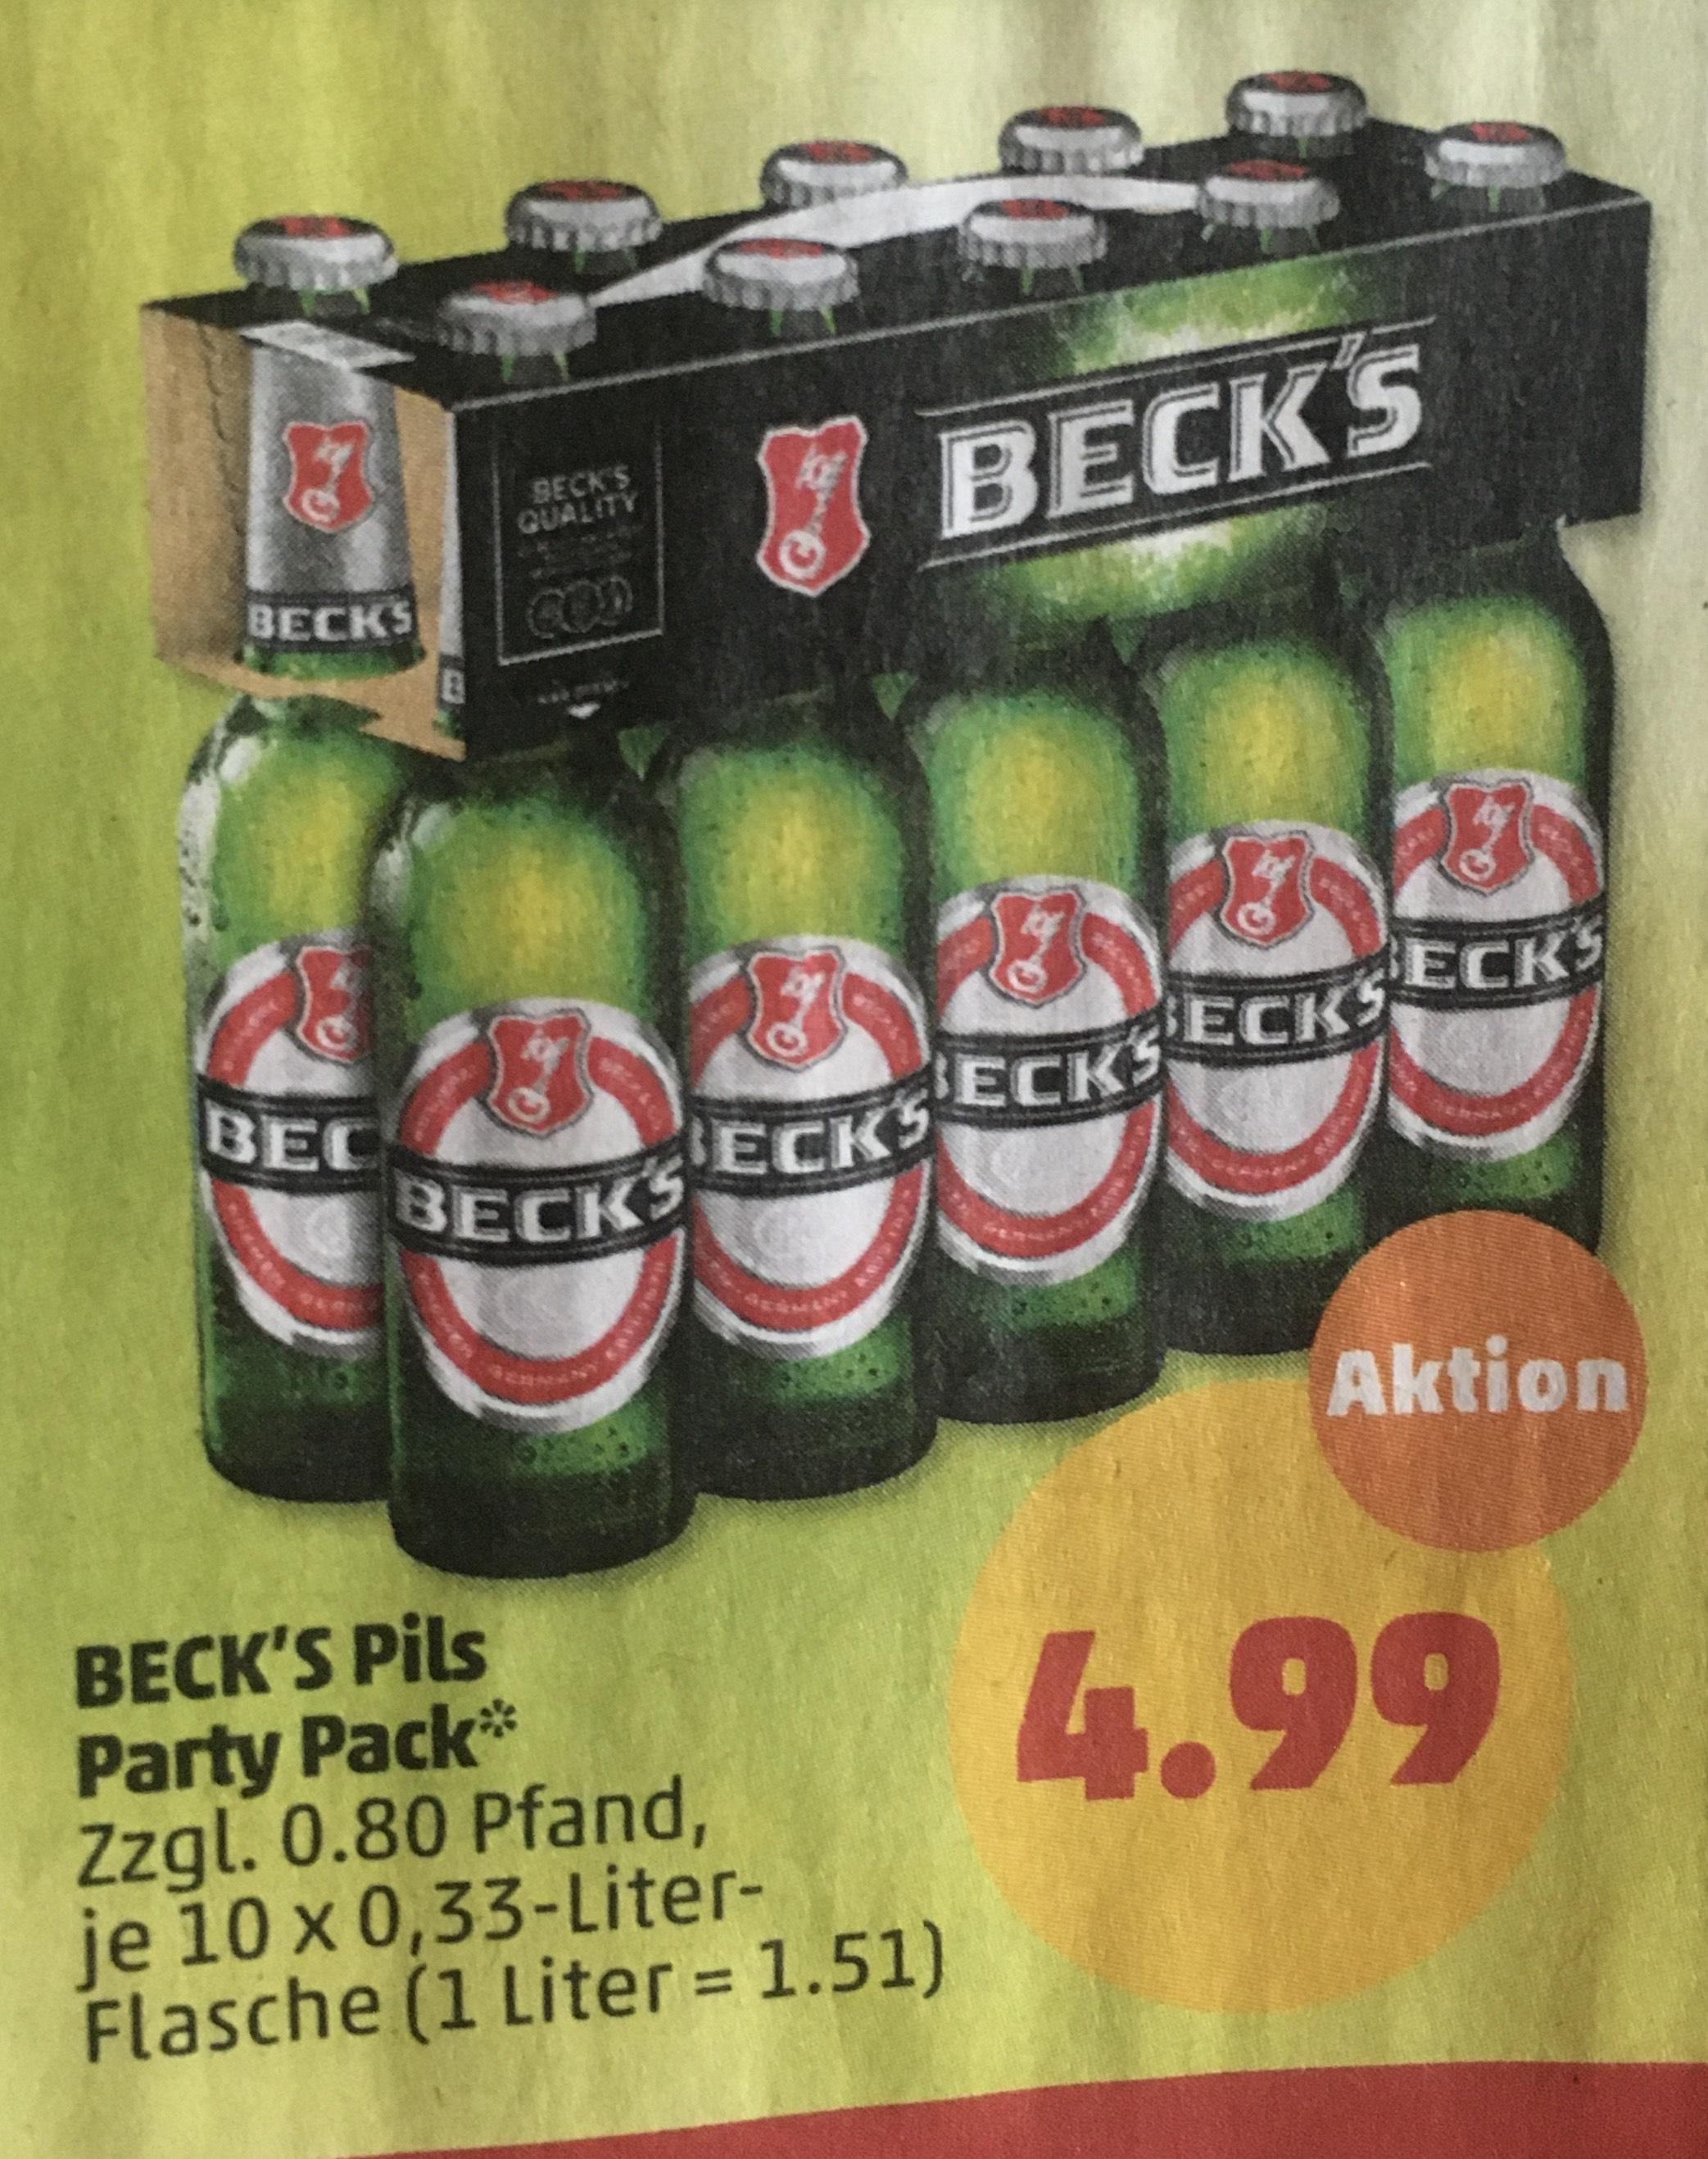 Becks Pils 10x0,33l Pack Penny